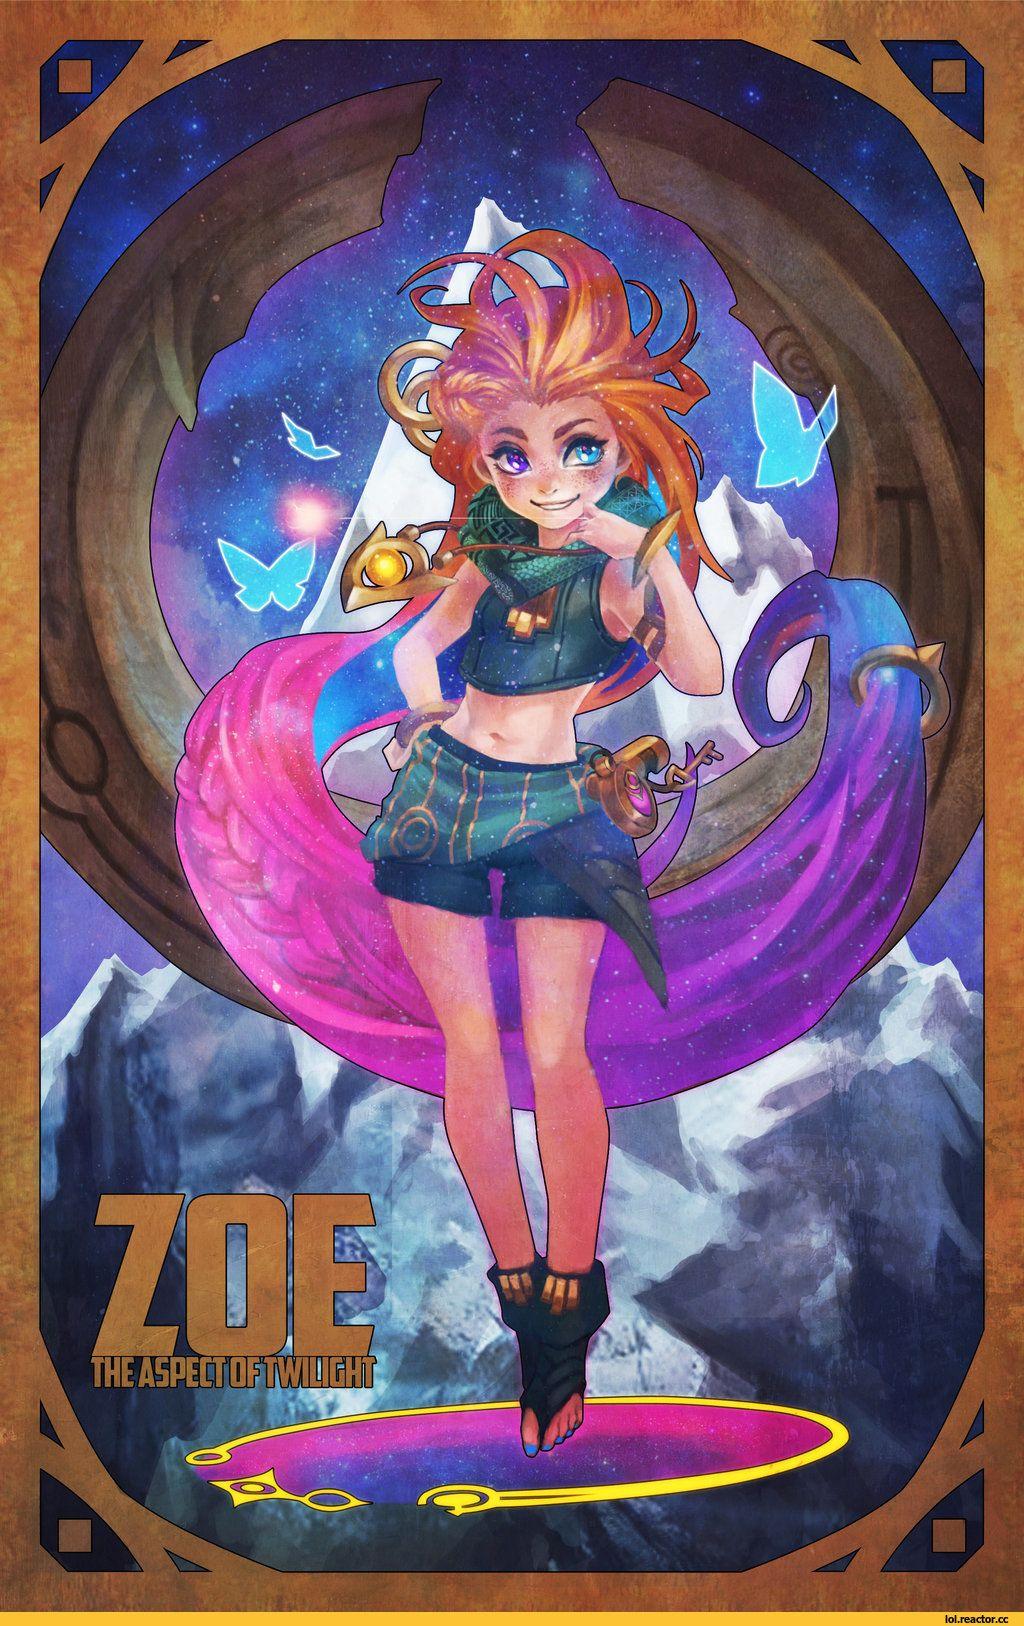 Zoe Lol League Of Legends Fendomy Monorirogue 4152859 Jpeg 1024 1612 Leona League Of Legends Desenhos Desenhos De Anime